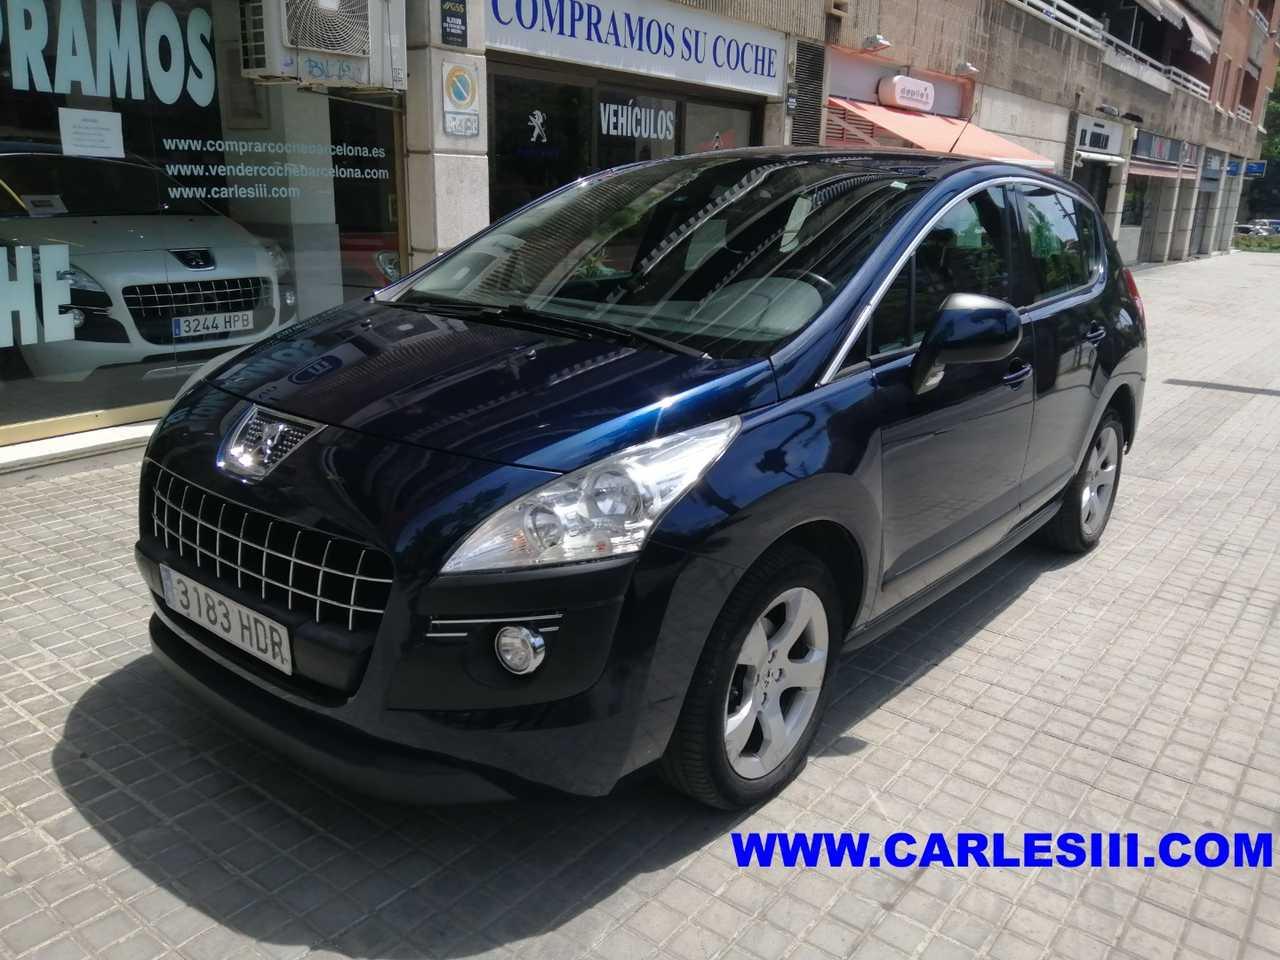 Peugeot 3008 Access 1.6 HDI 112 FAP   - Foto 1